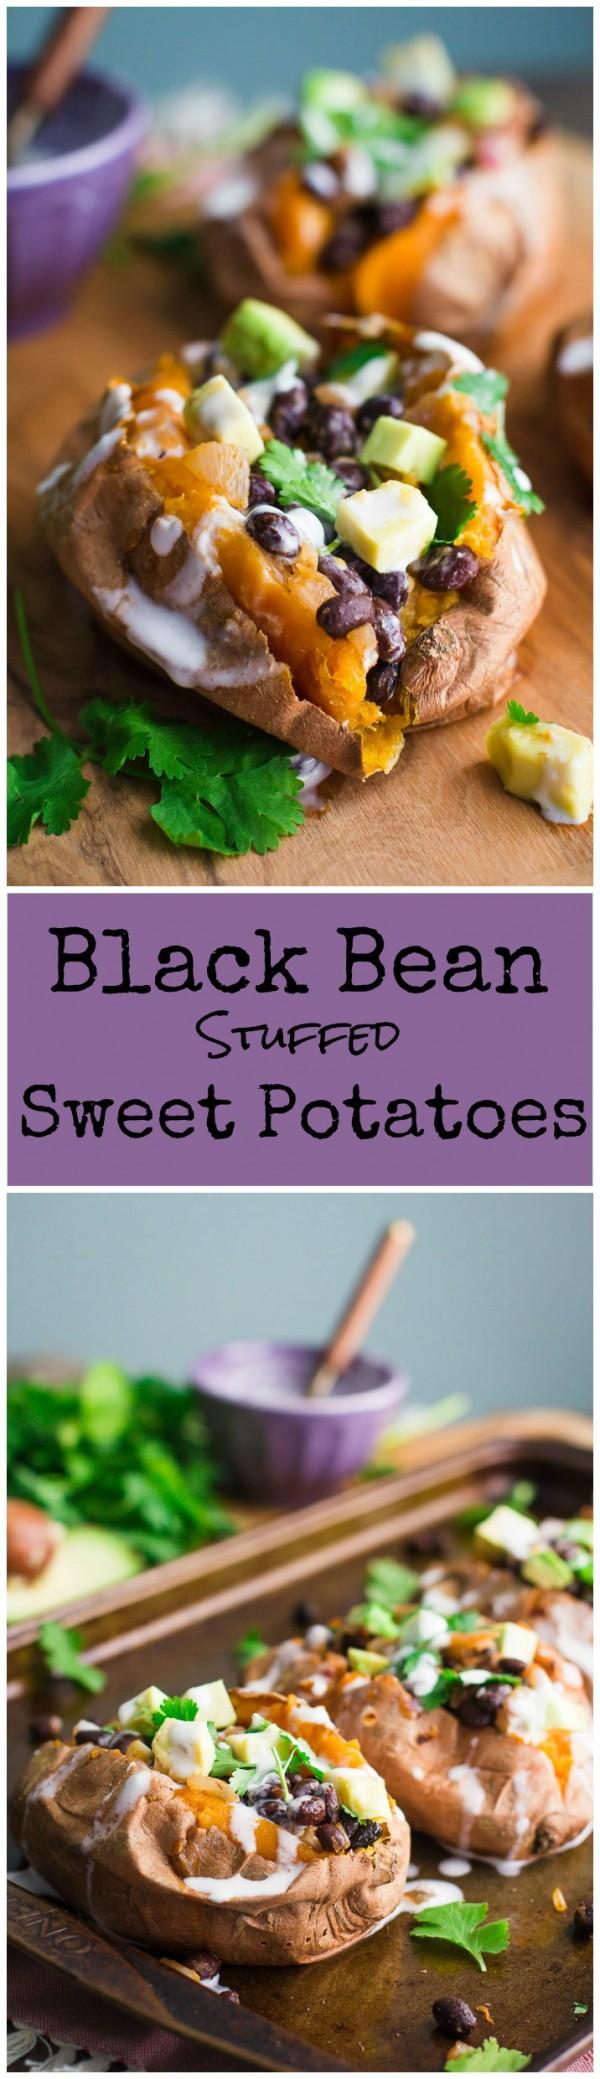 Get the recipe Black Bean Stuffed Sweet Potatoes @recipes_to_go